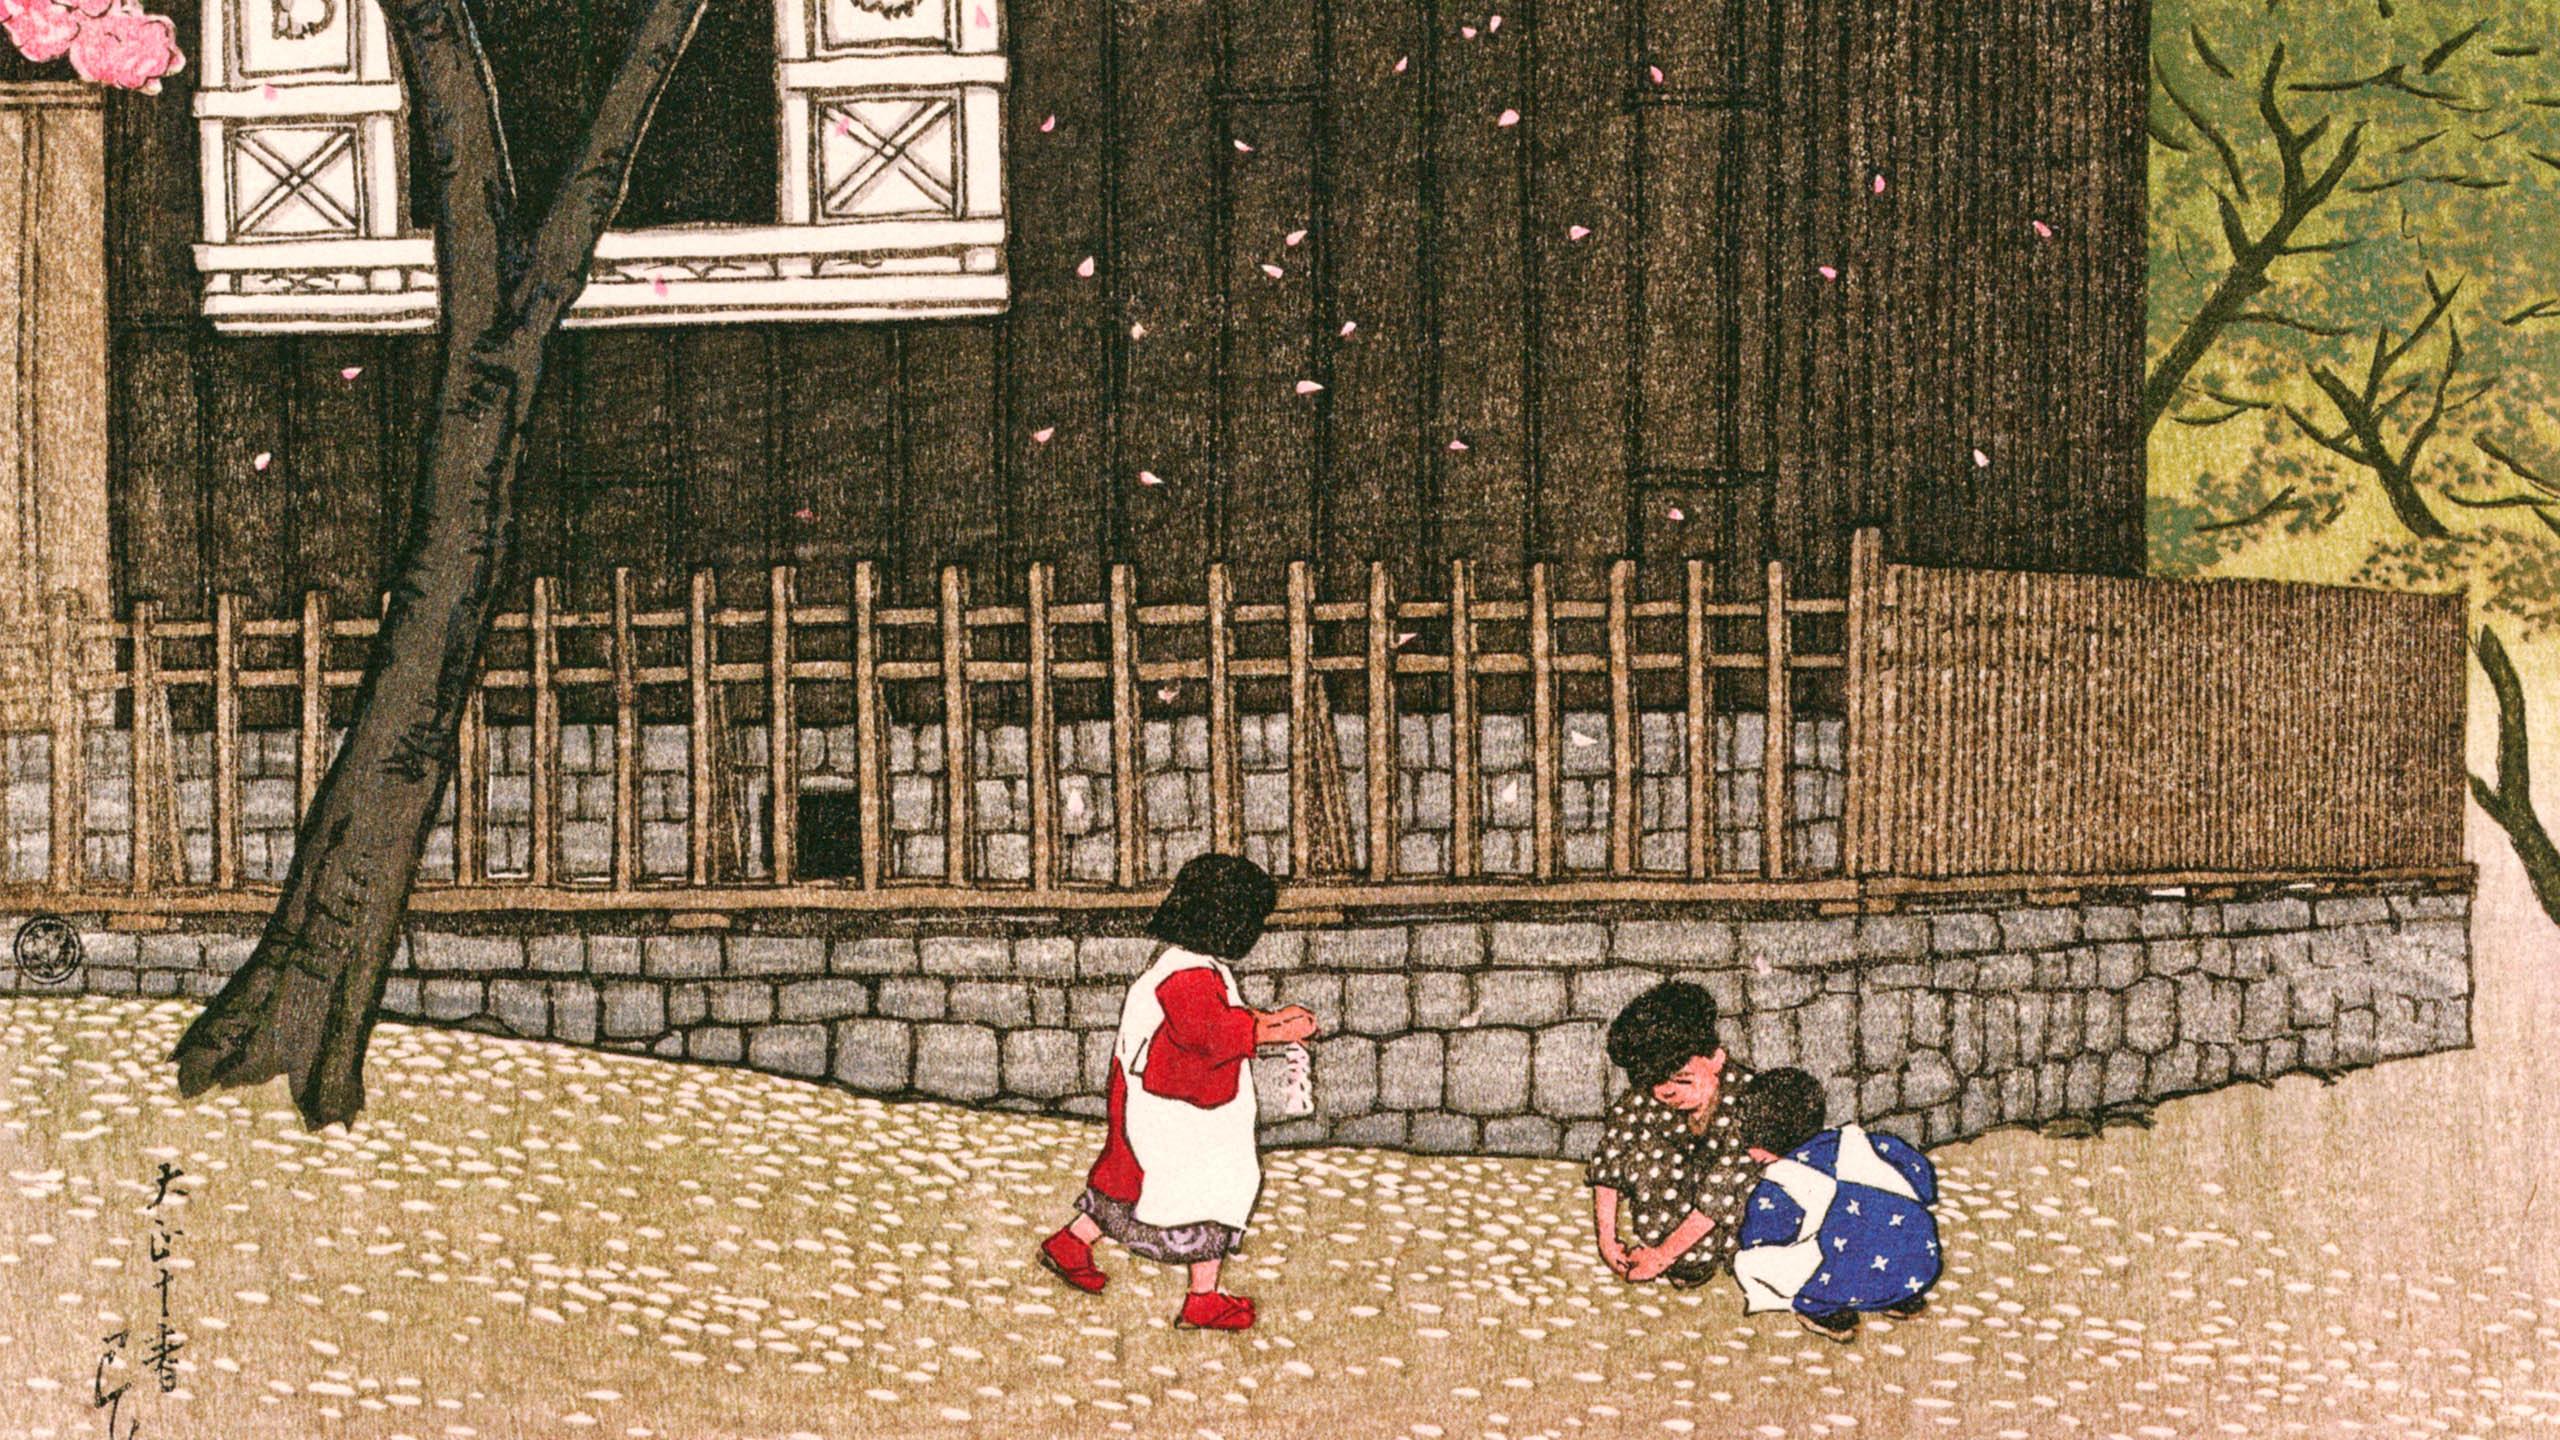 Kawase Hasui - Haru no atagoyama 2560x1440